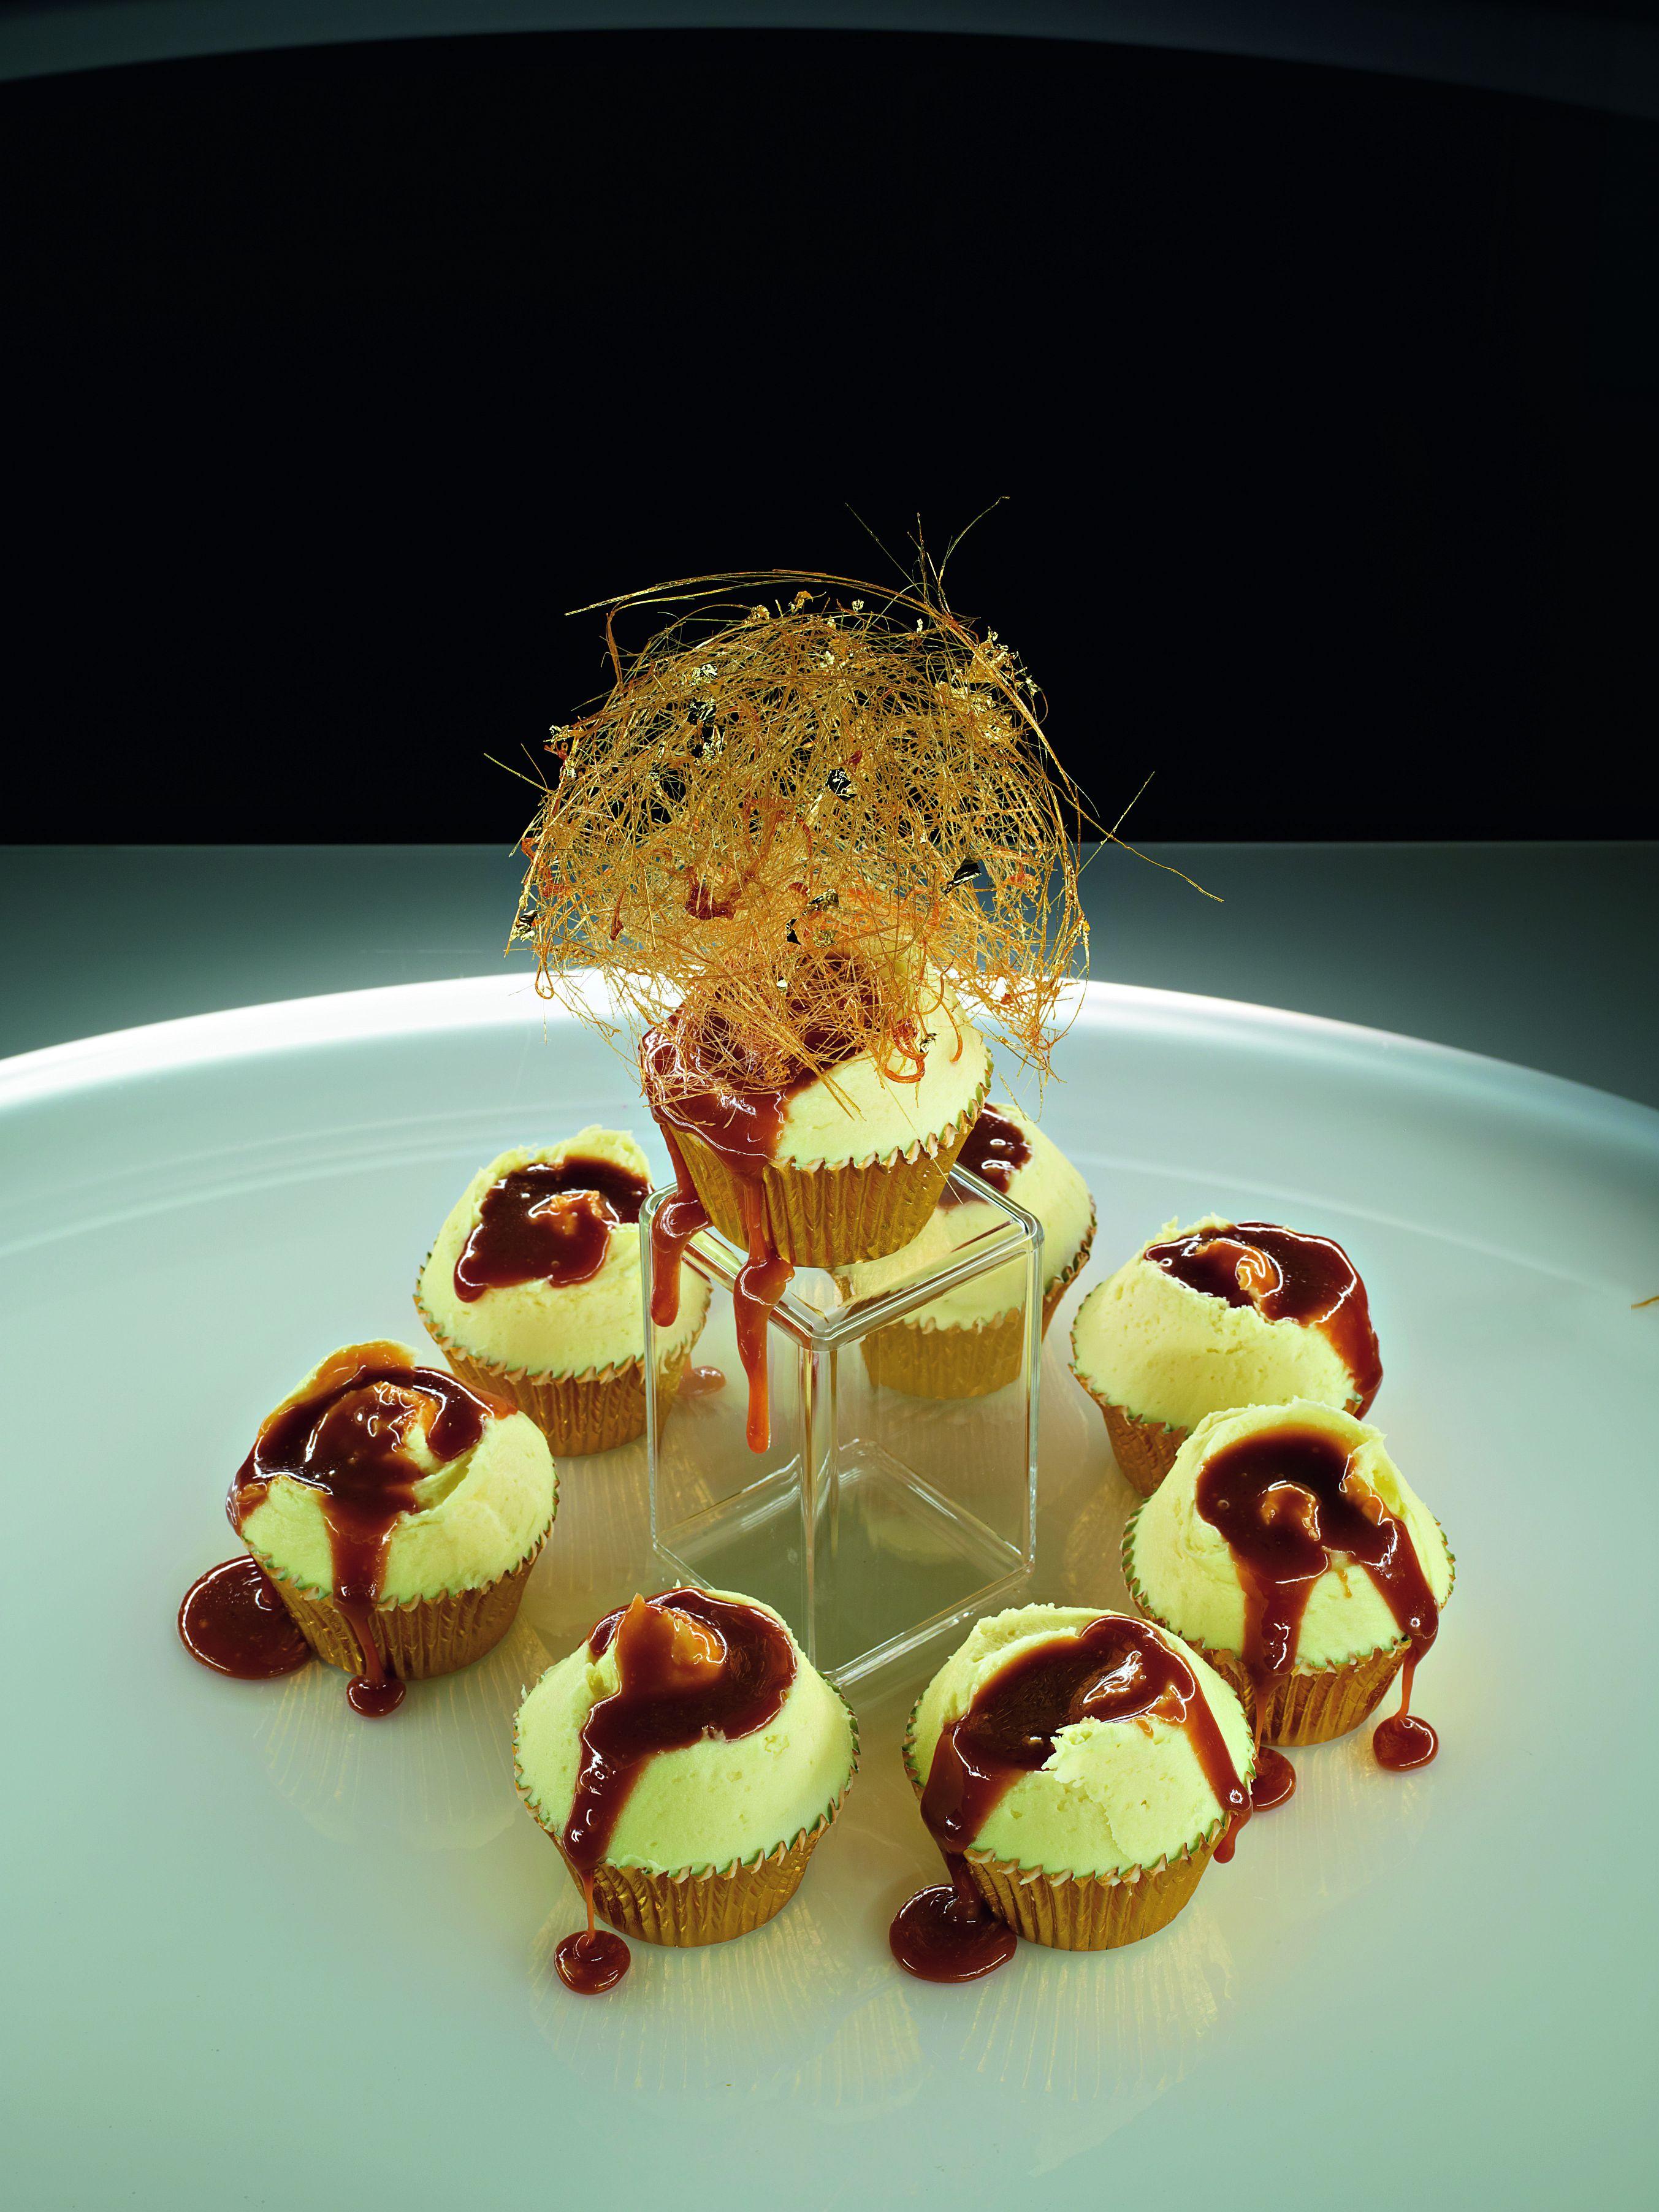 TBT Recipe: Salted Butter Caramel Cupcakes